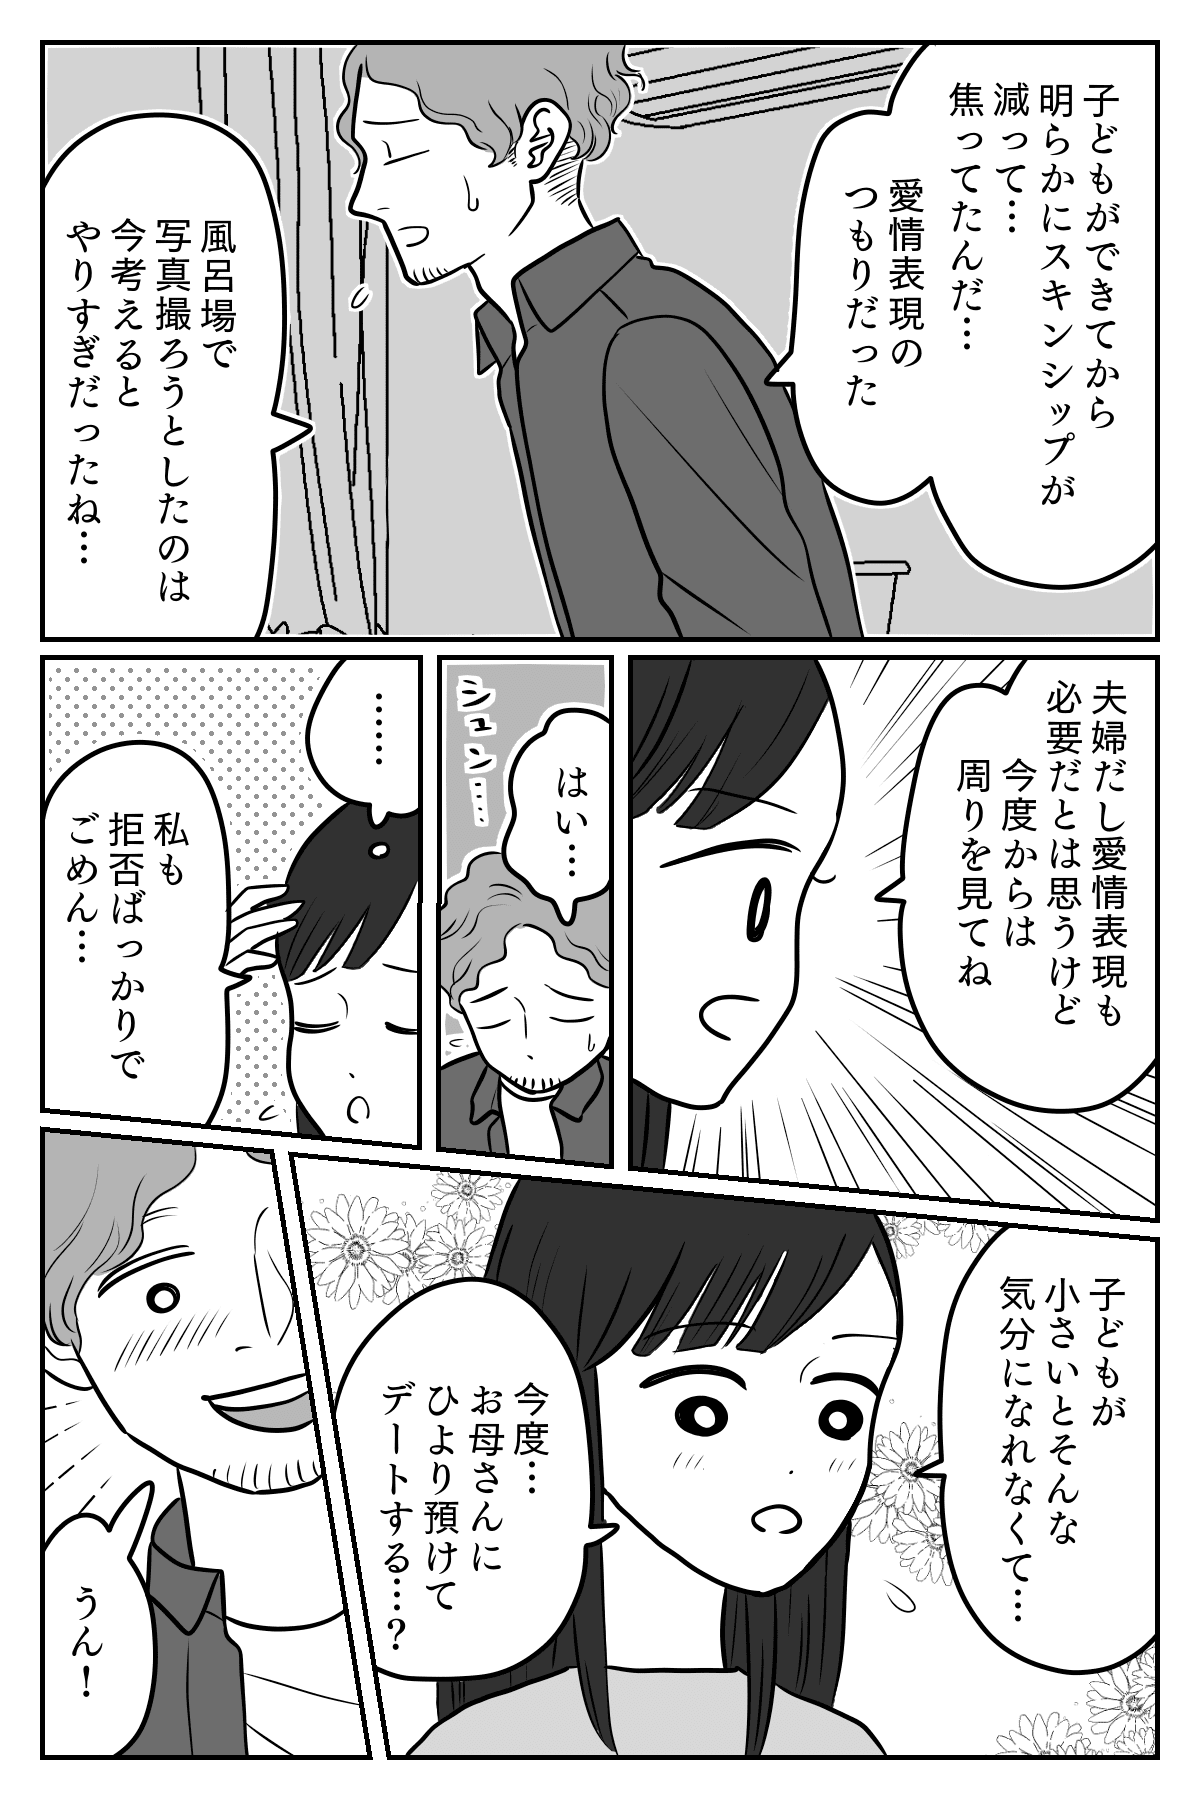 盗撮2-3